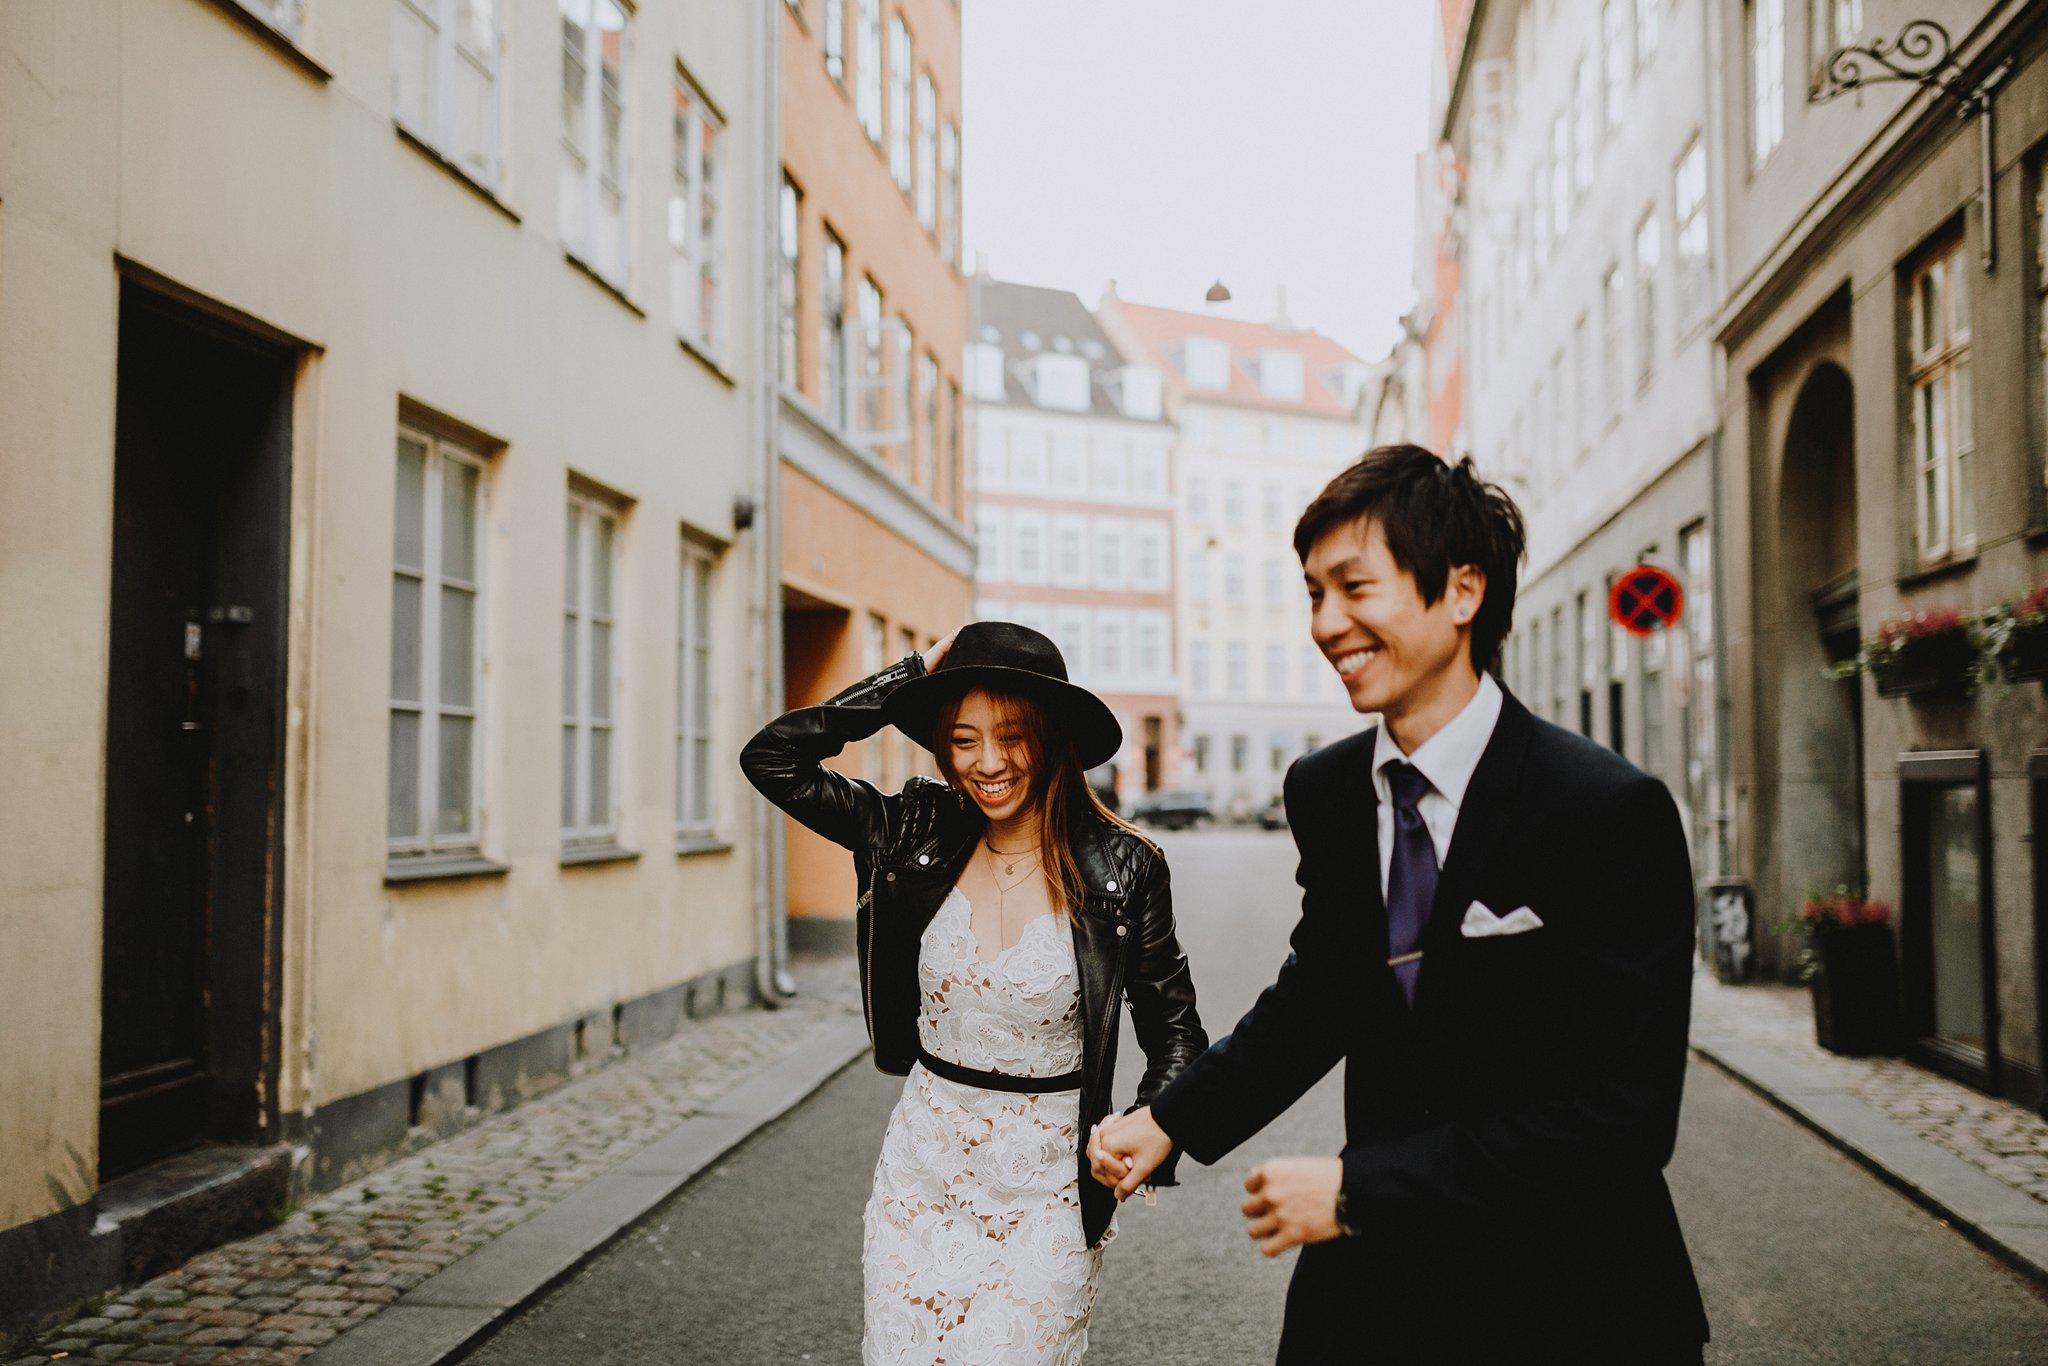 Destination_Wedding_Copenhagen_Europe_Denmark_Carolina_Segre_Photography_0102.jpg